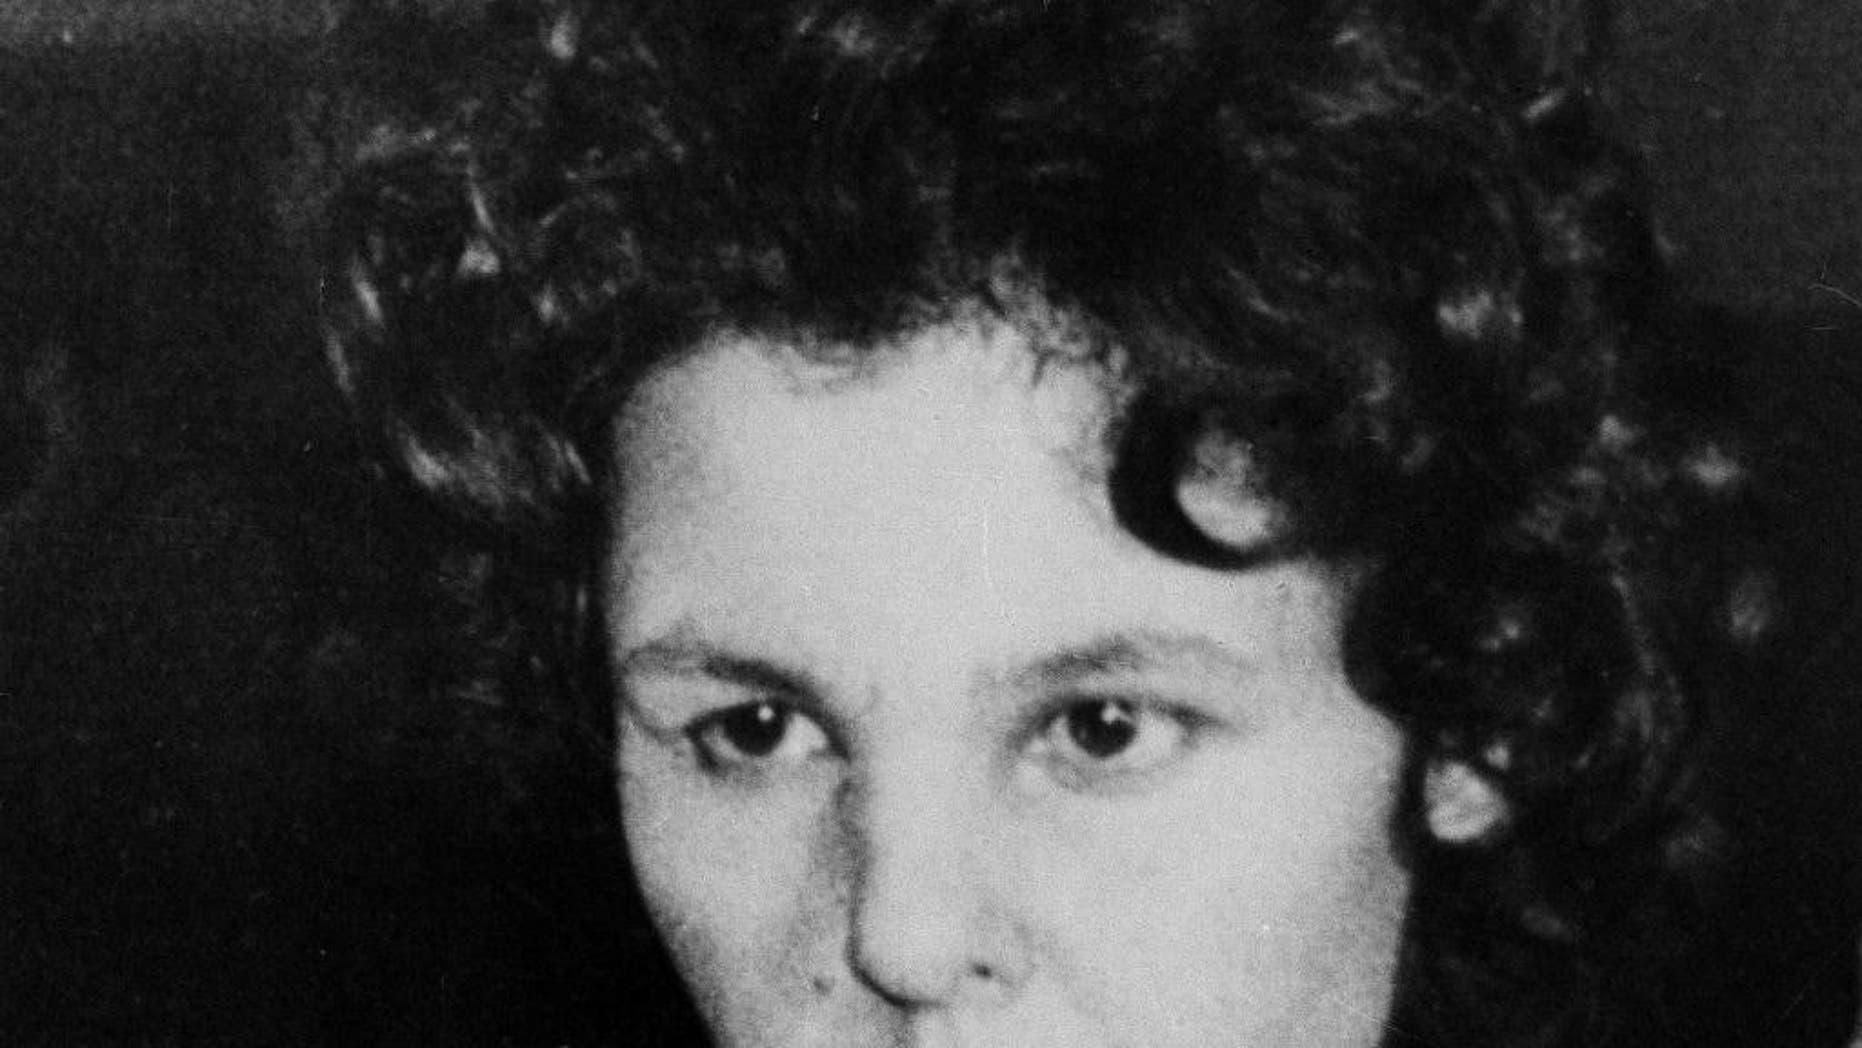 Westlake Legal Group bd094efe6e8b461b86e0b6b6fa26a8a8 Parole granted to woman who was getaway driver in deadly 1981 Brink's heist Samuel Chamberlain fox-news/us/us-regions/northeast/new-york fox-news/us/crime fox news fnc/us fnc cb4208a8-aaaa-5c74-b9cf-957cffb564bd article